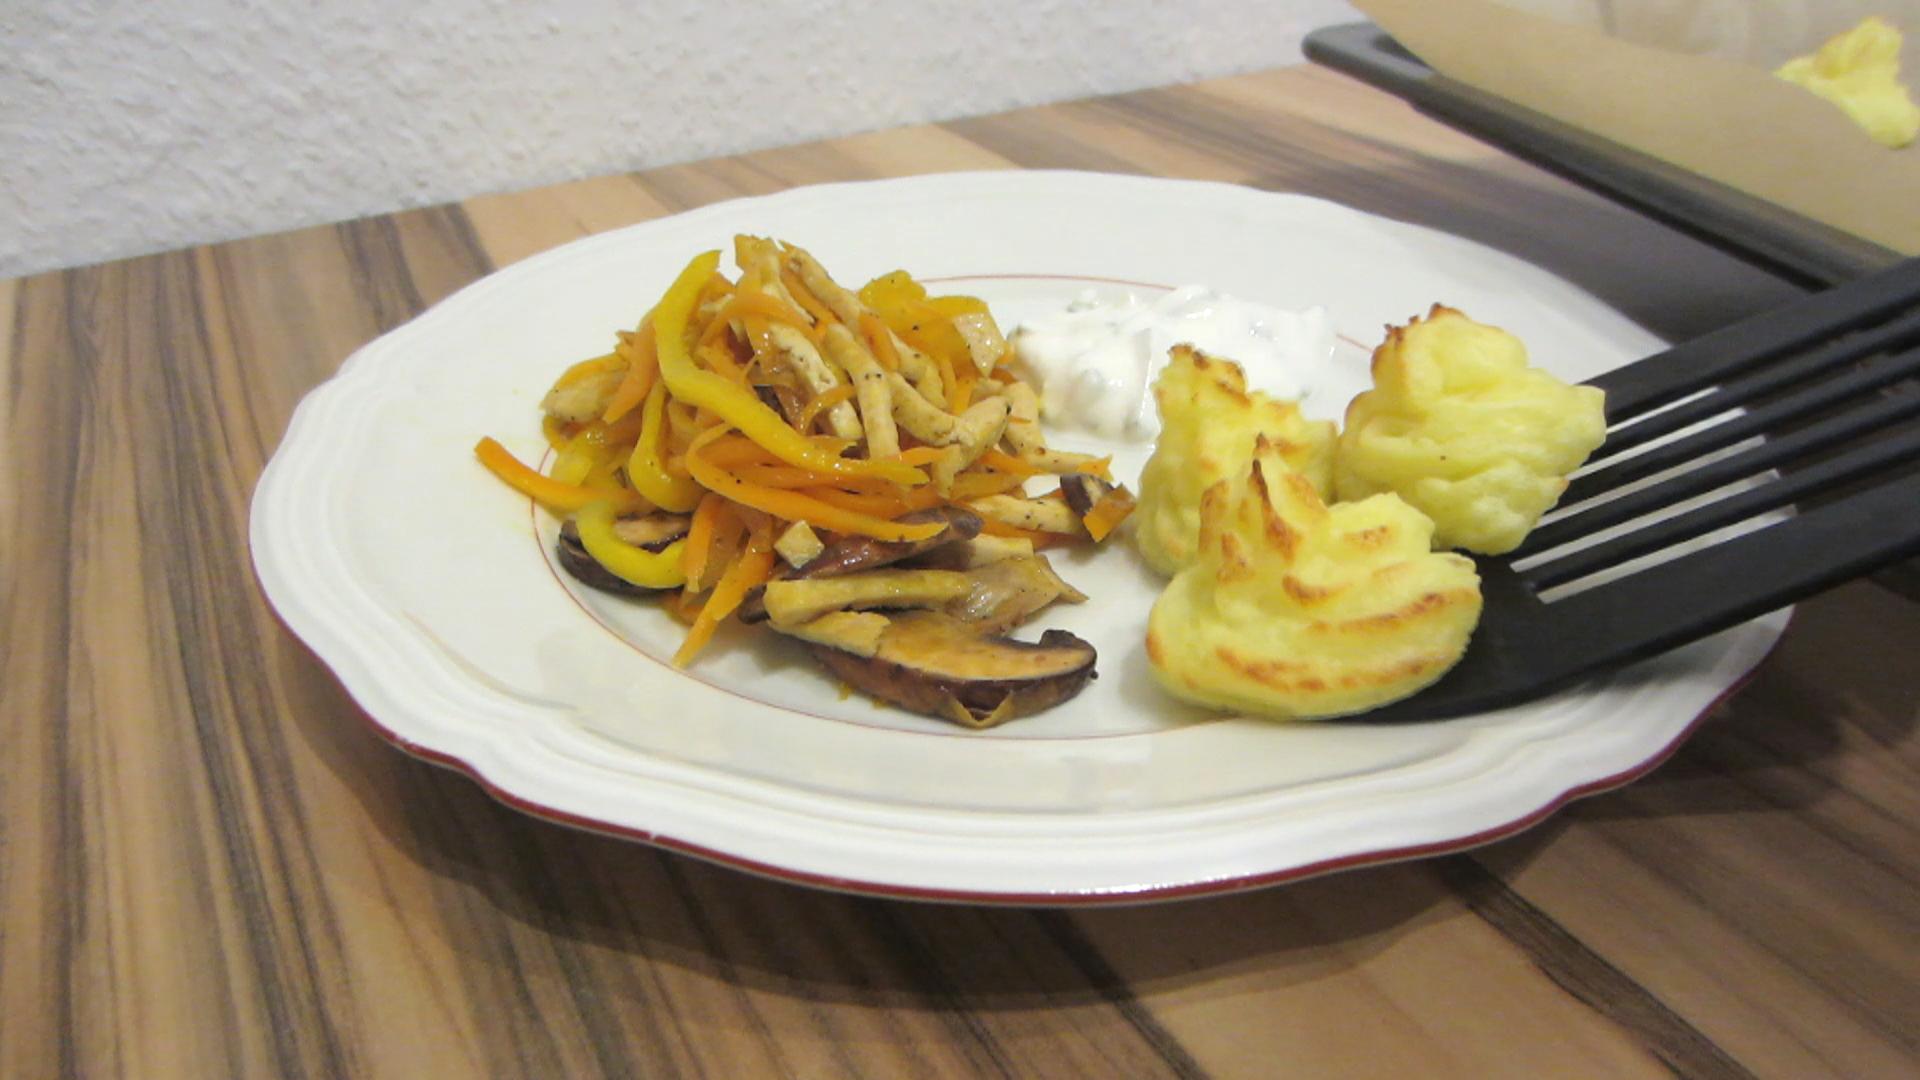 2014-05-30-Herzoginkartoffeln-Dutchess-Potatoes-24.jpg